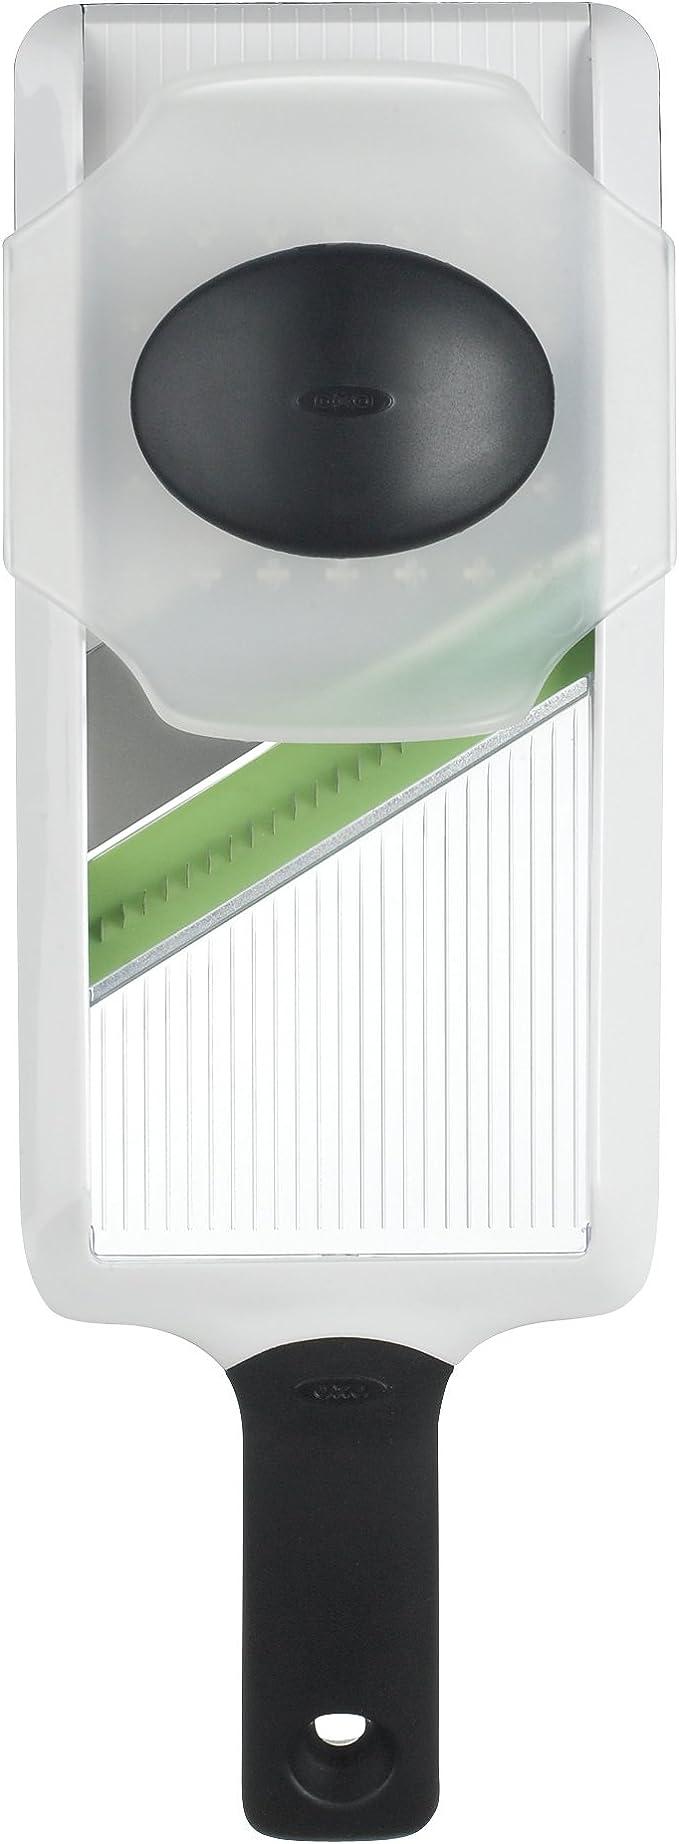 Bianco Plastica OXO Mandolina per Julienne